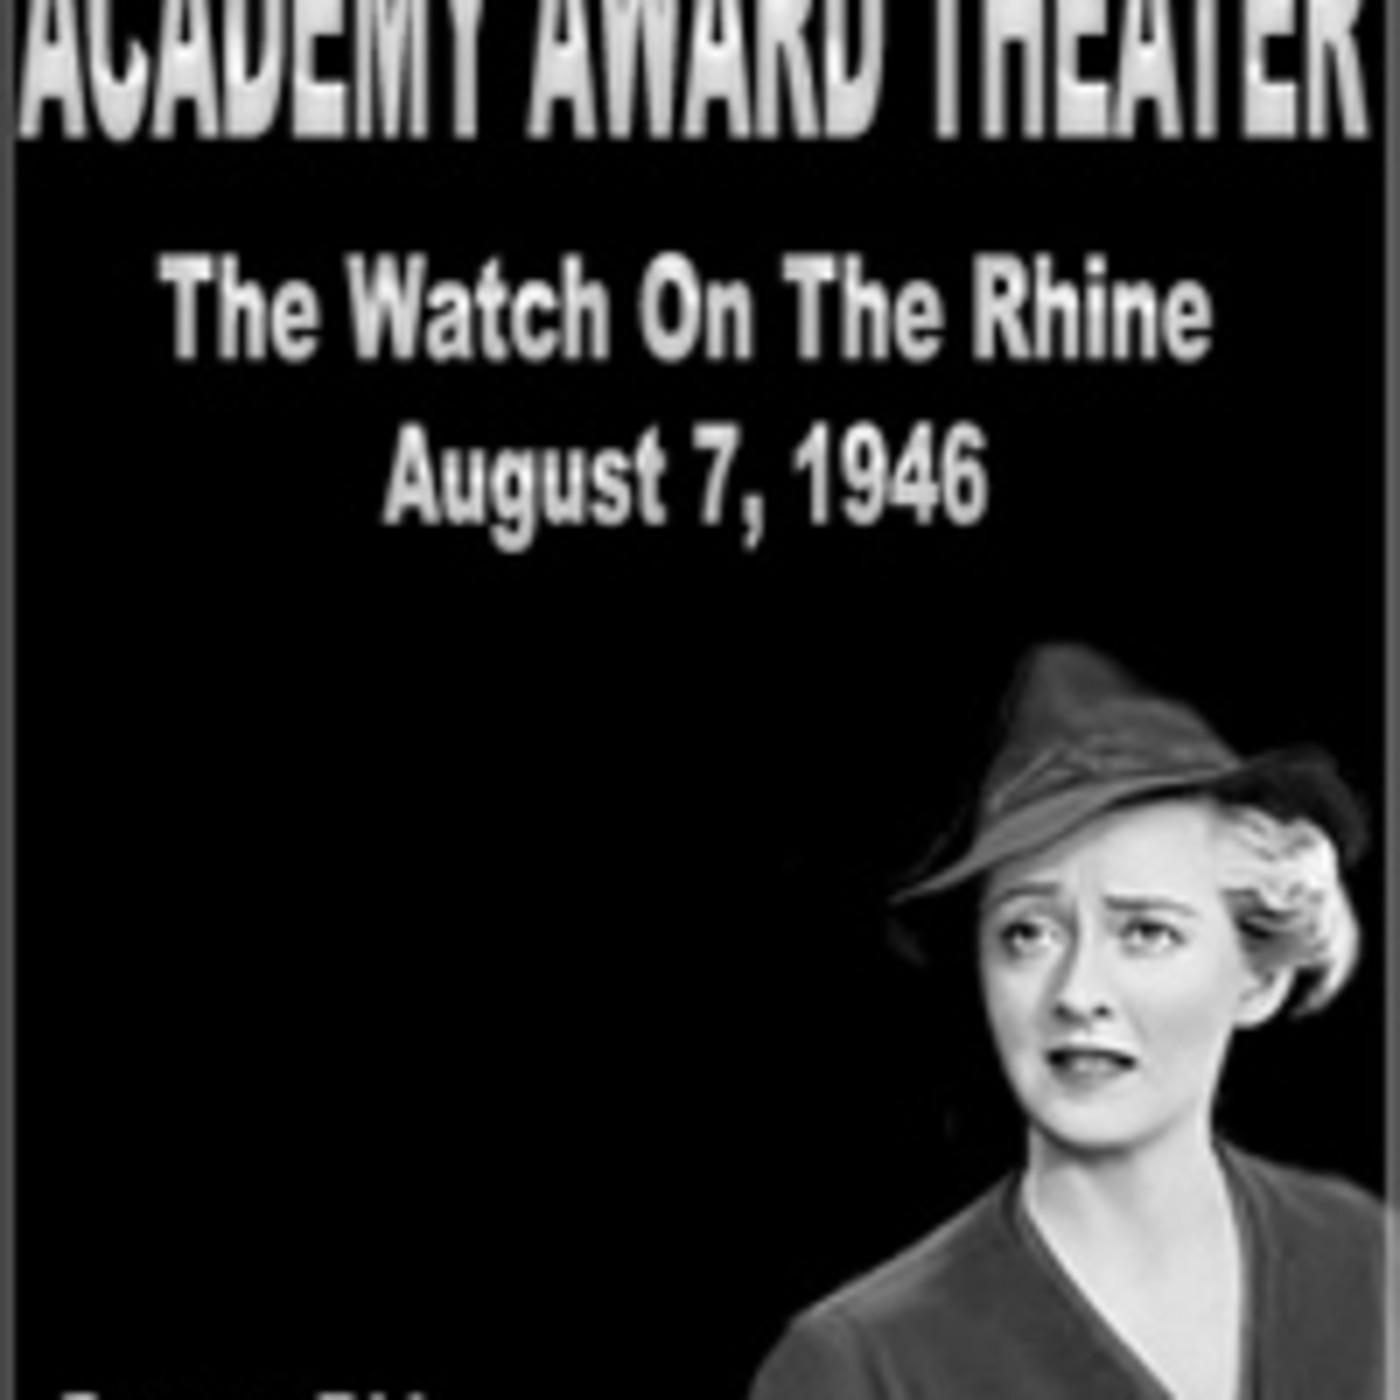 Academy Award Theater - The Watch On The Rhine (08-07-46)